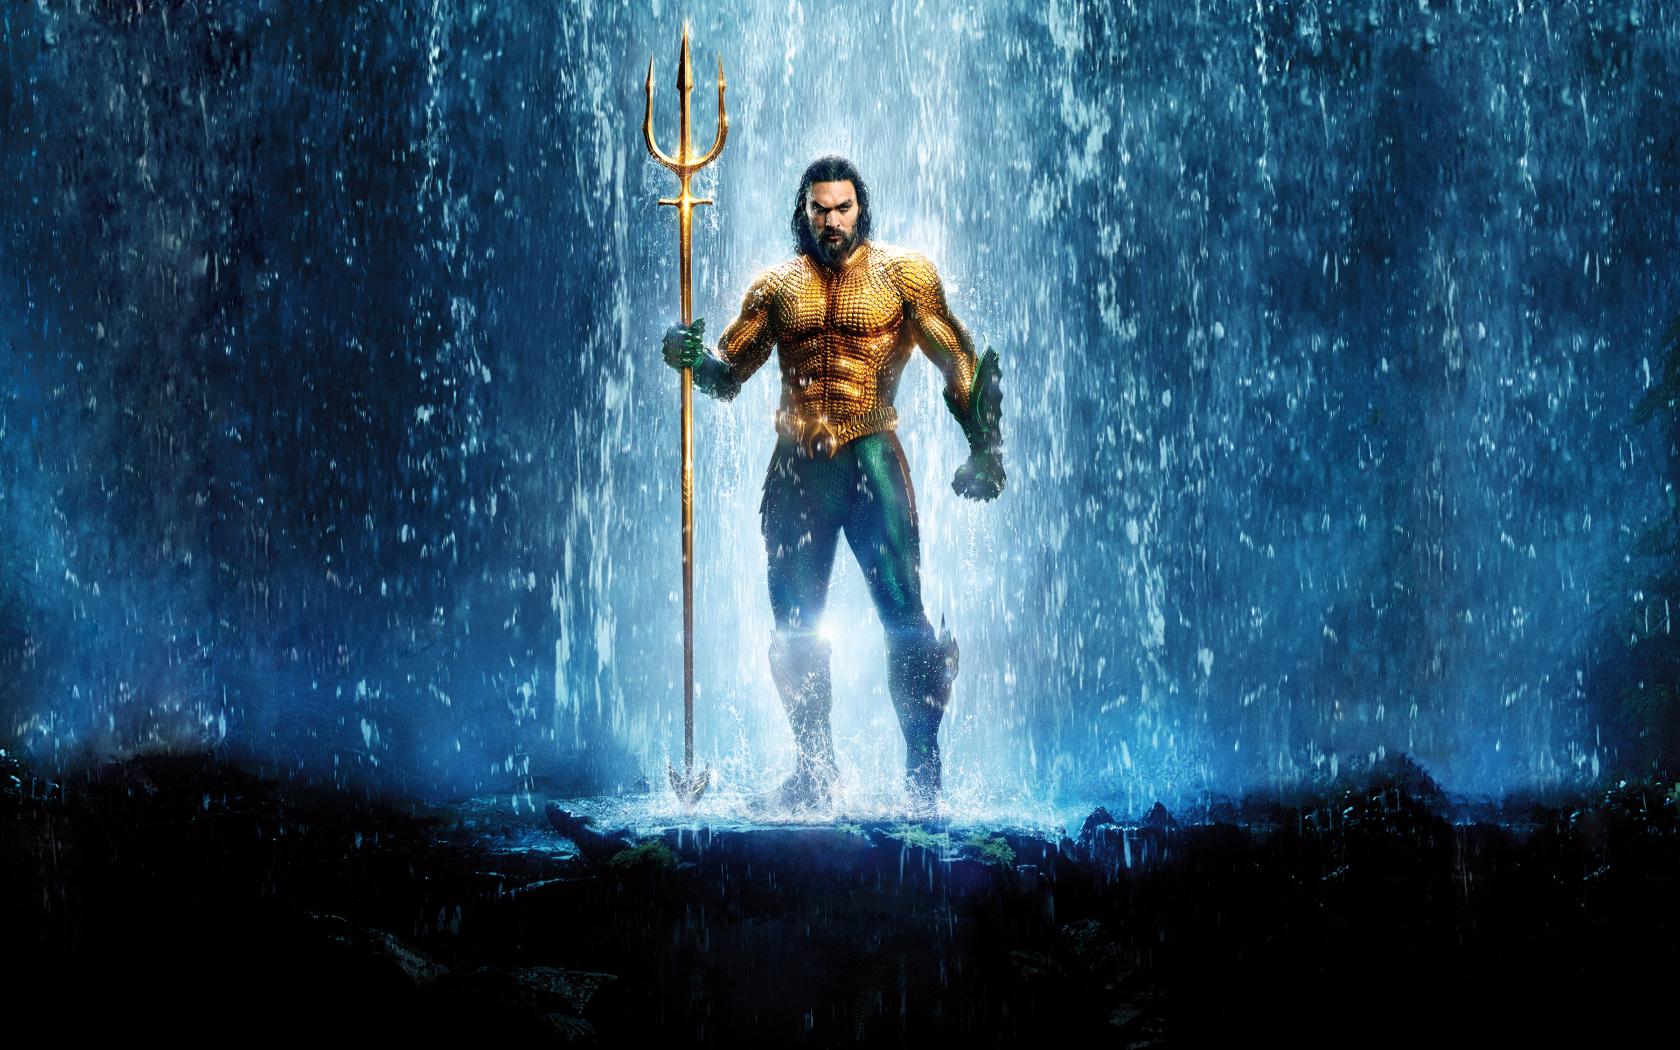 Aquaman Textless Poster 2018, HD 4K Wallpaper